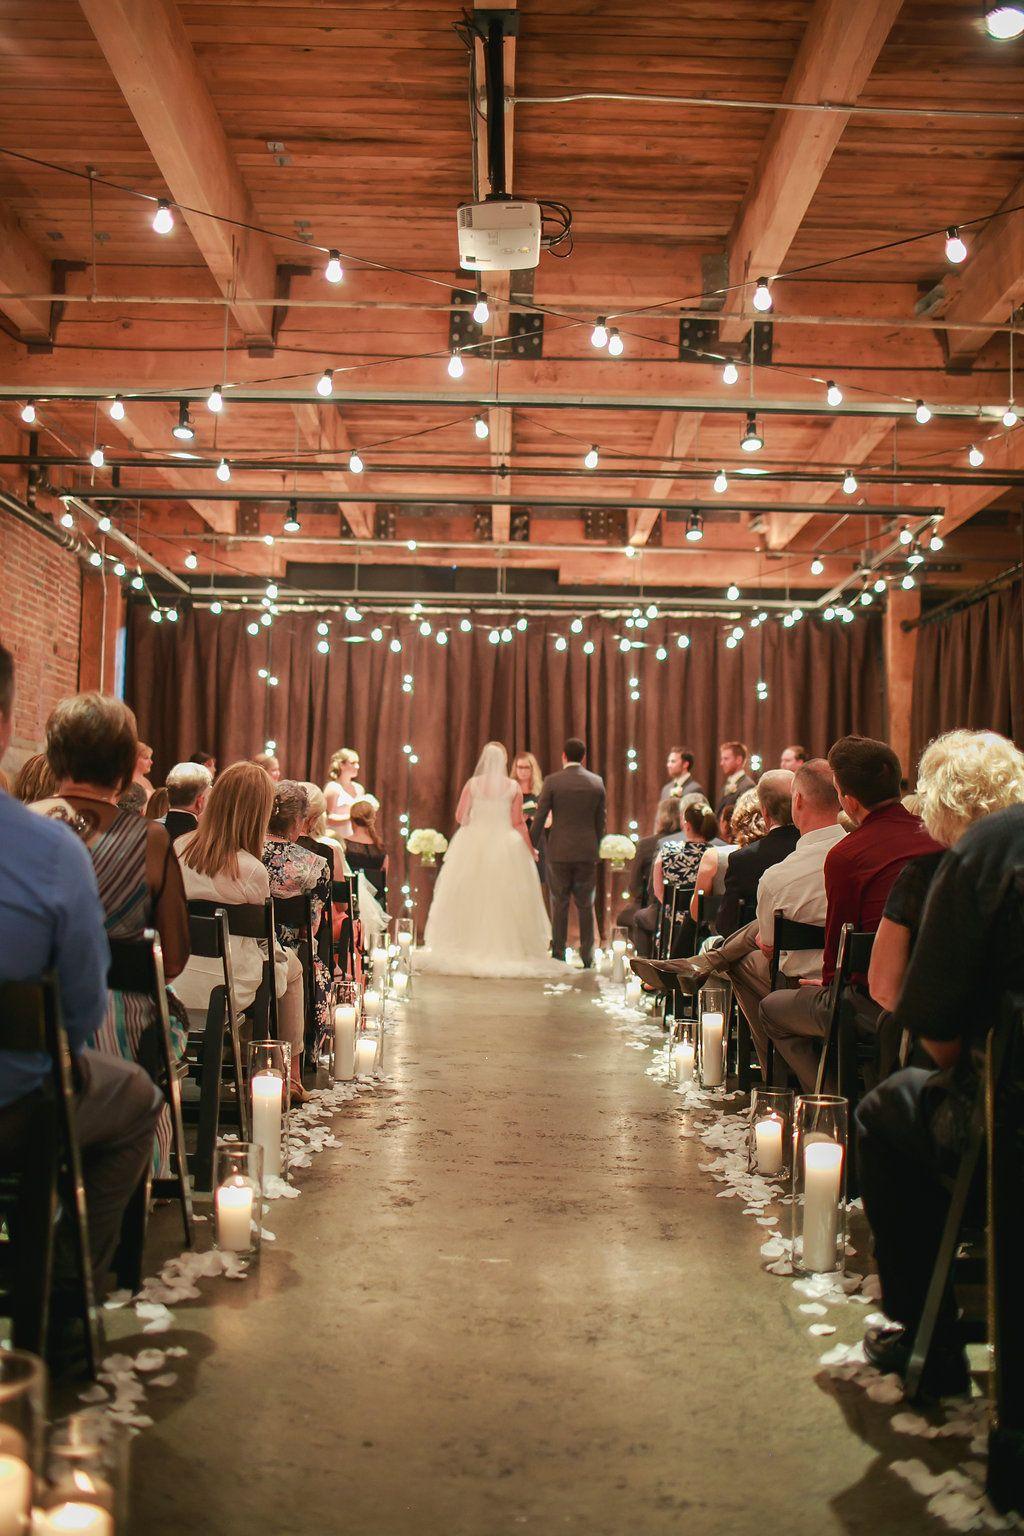 Another breathtaking ceremony at Melrose Market Studios on Capitol Hill! Ravishing Radish Catering | Amanda Lloyd Photography